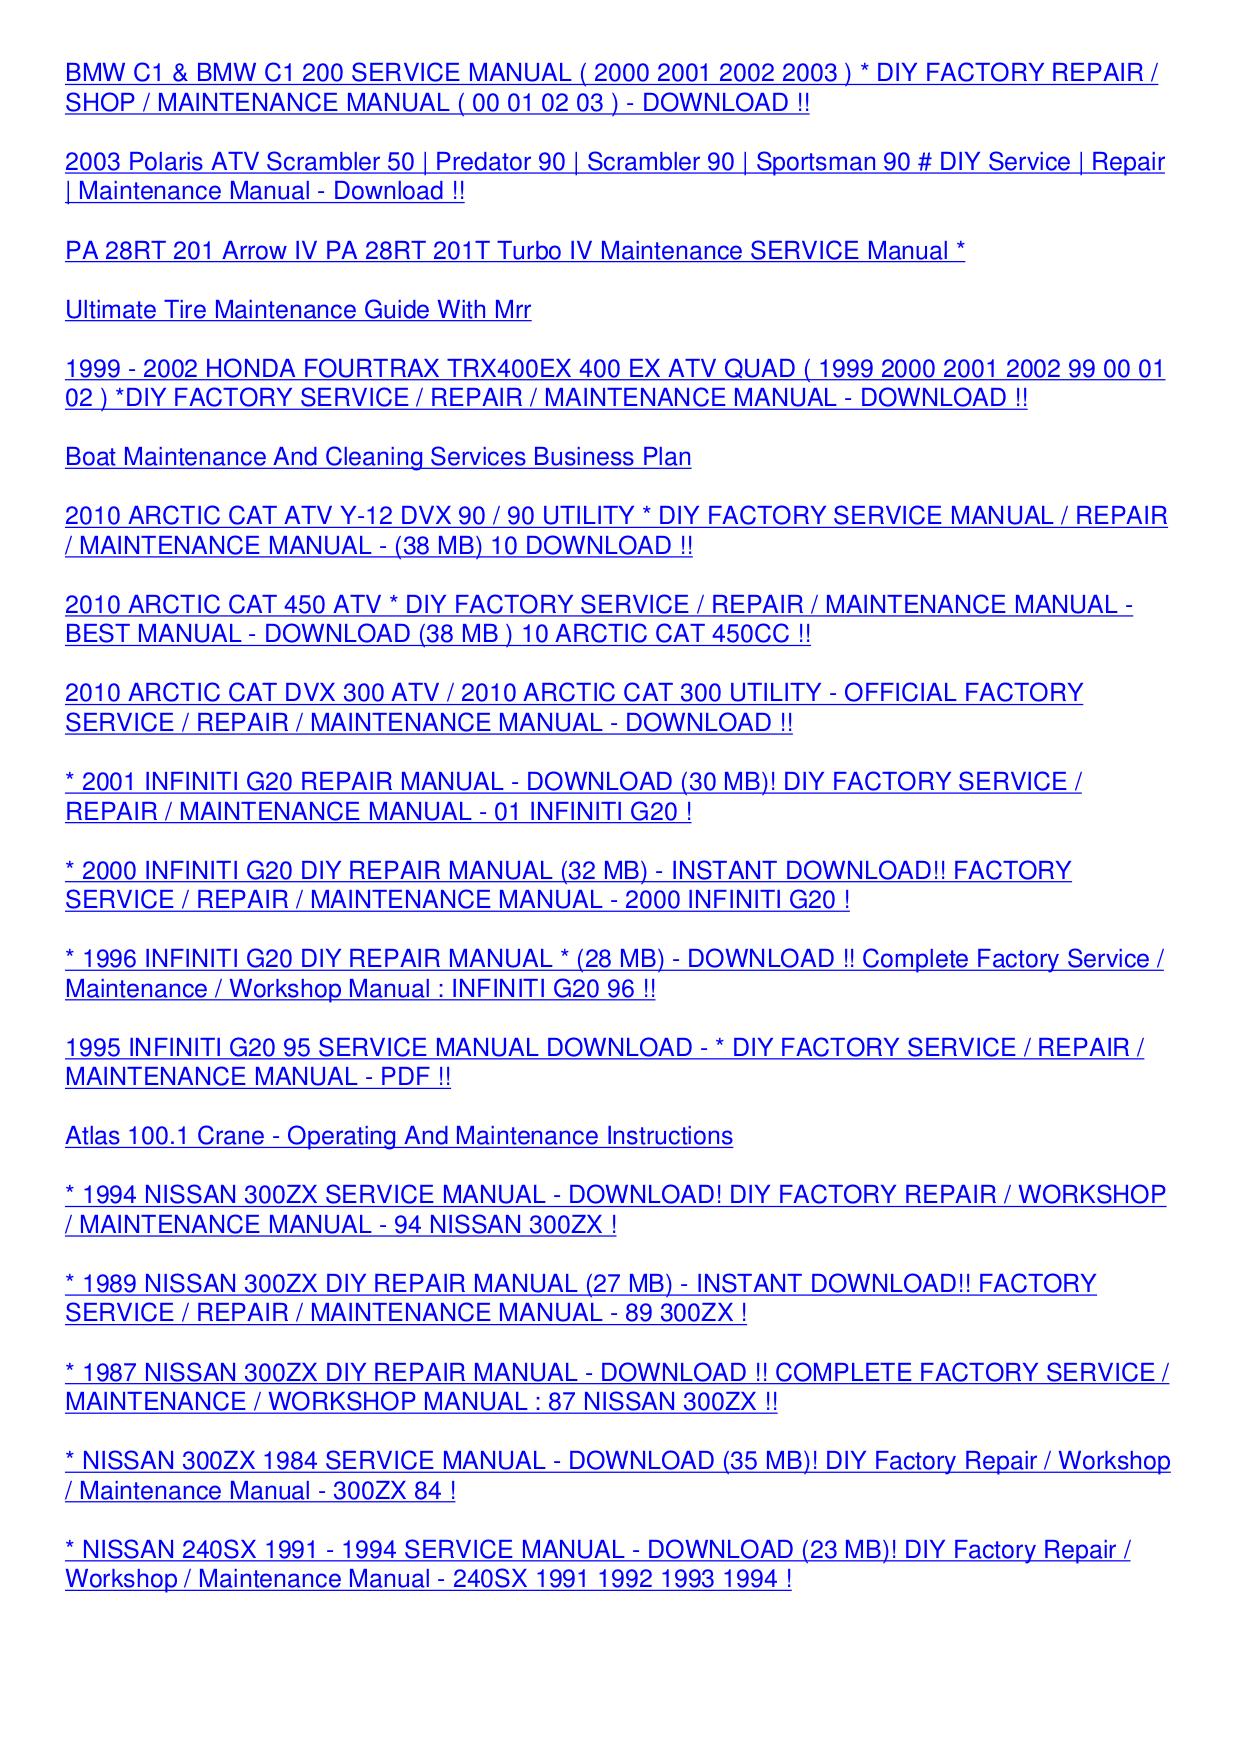 Polaroid xs7hd manual ebook array polaroid xs7hd manual ebook rh polaroid xs7hd manual ebook tempower us fandeluxe Image collections